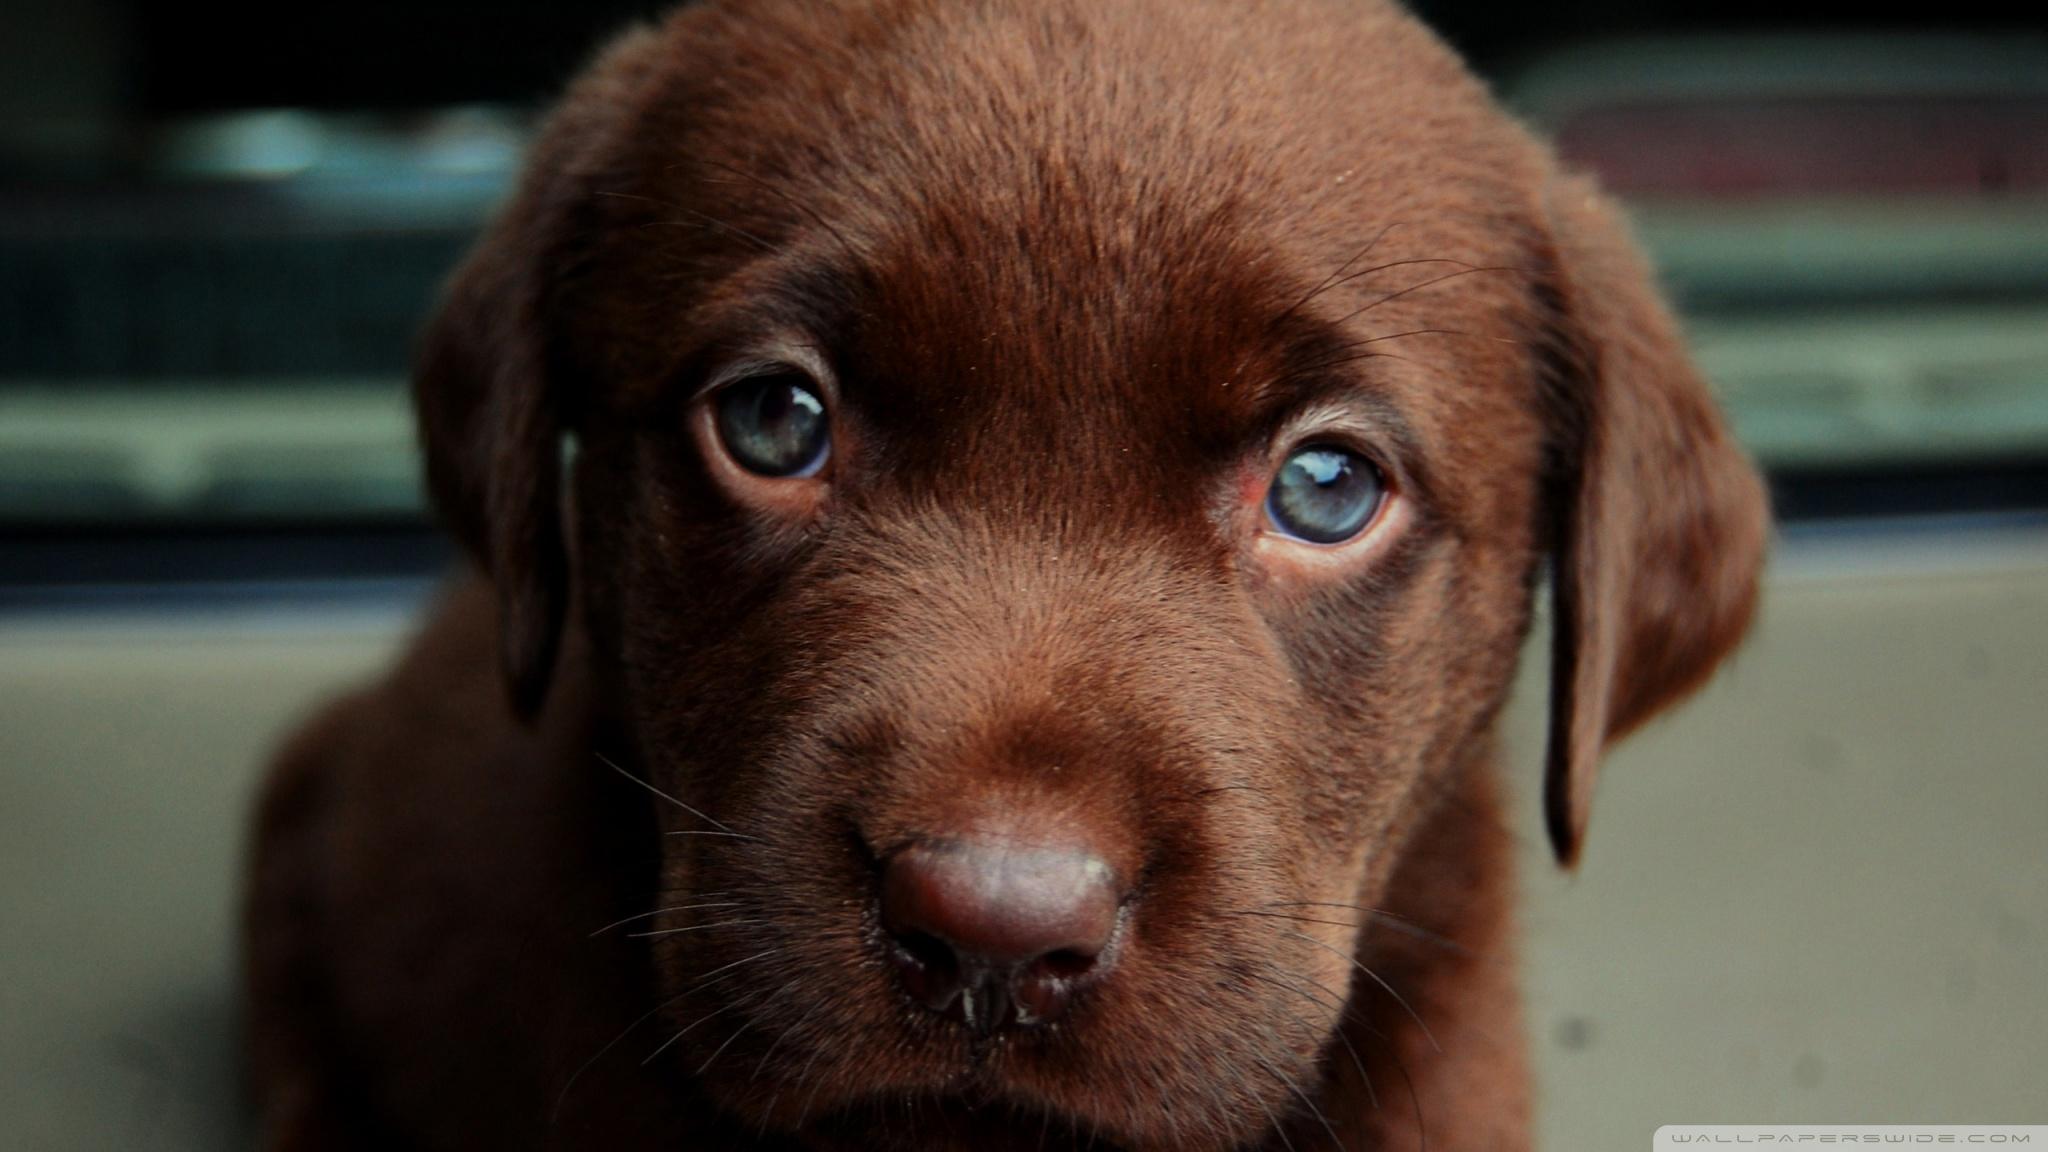 Cute Dog Wallpapers Fot Google Chocolate Puppy 4k Hd Desktop Wallpaper For 4k Ultra Hd Tv